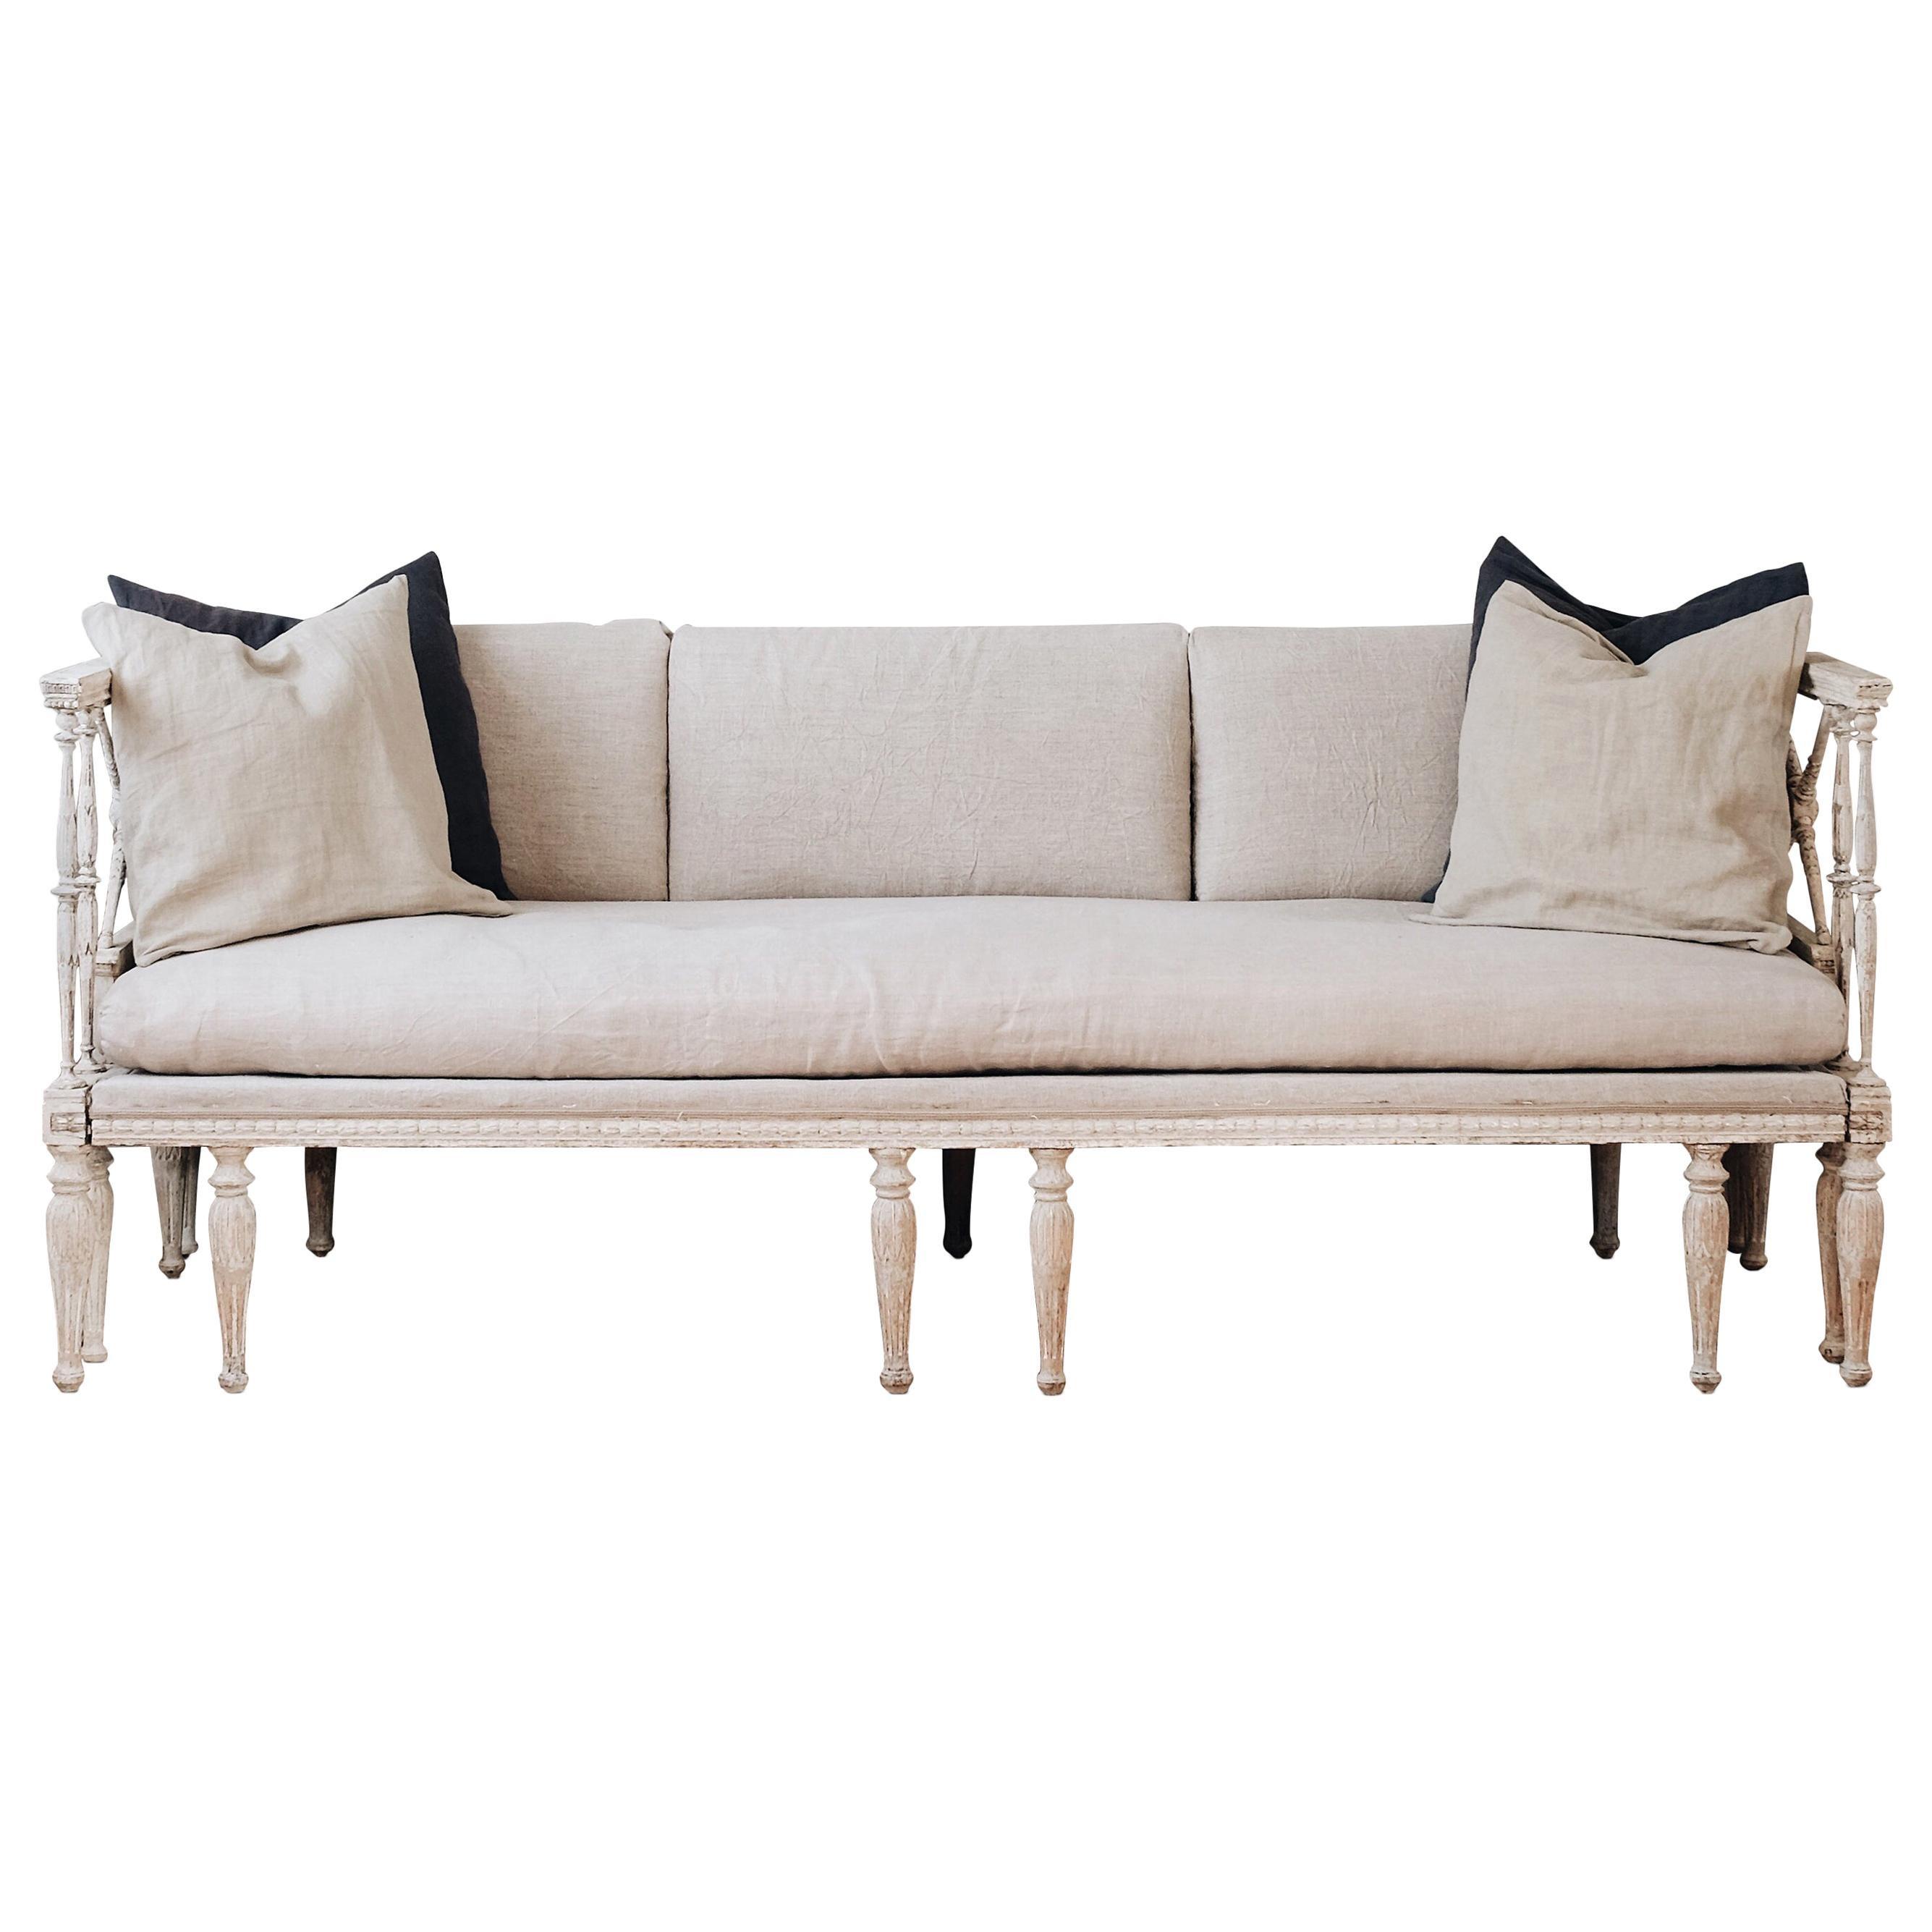 Fine 19th Century Gustavian Daybed Sofa